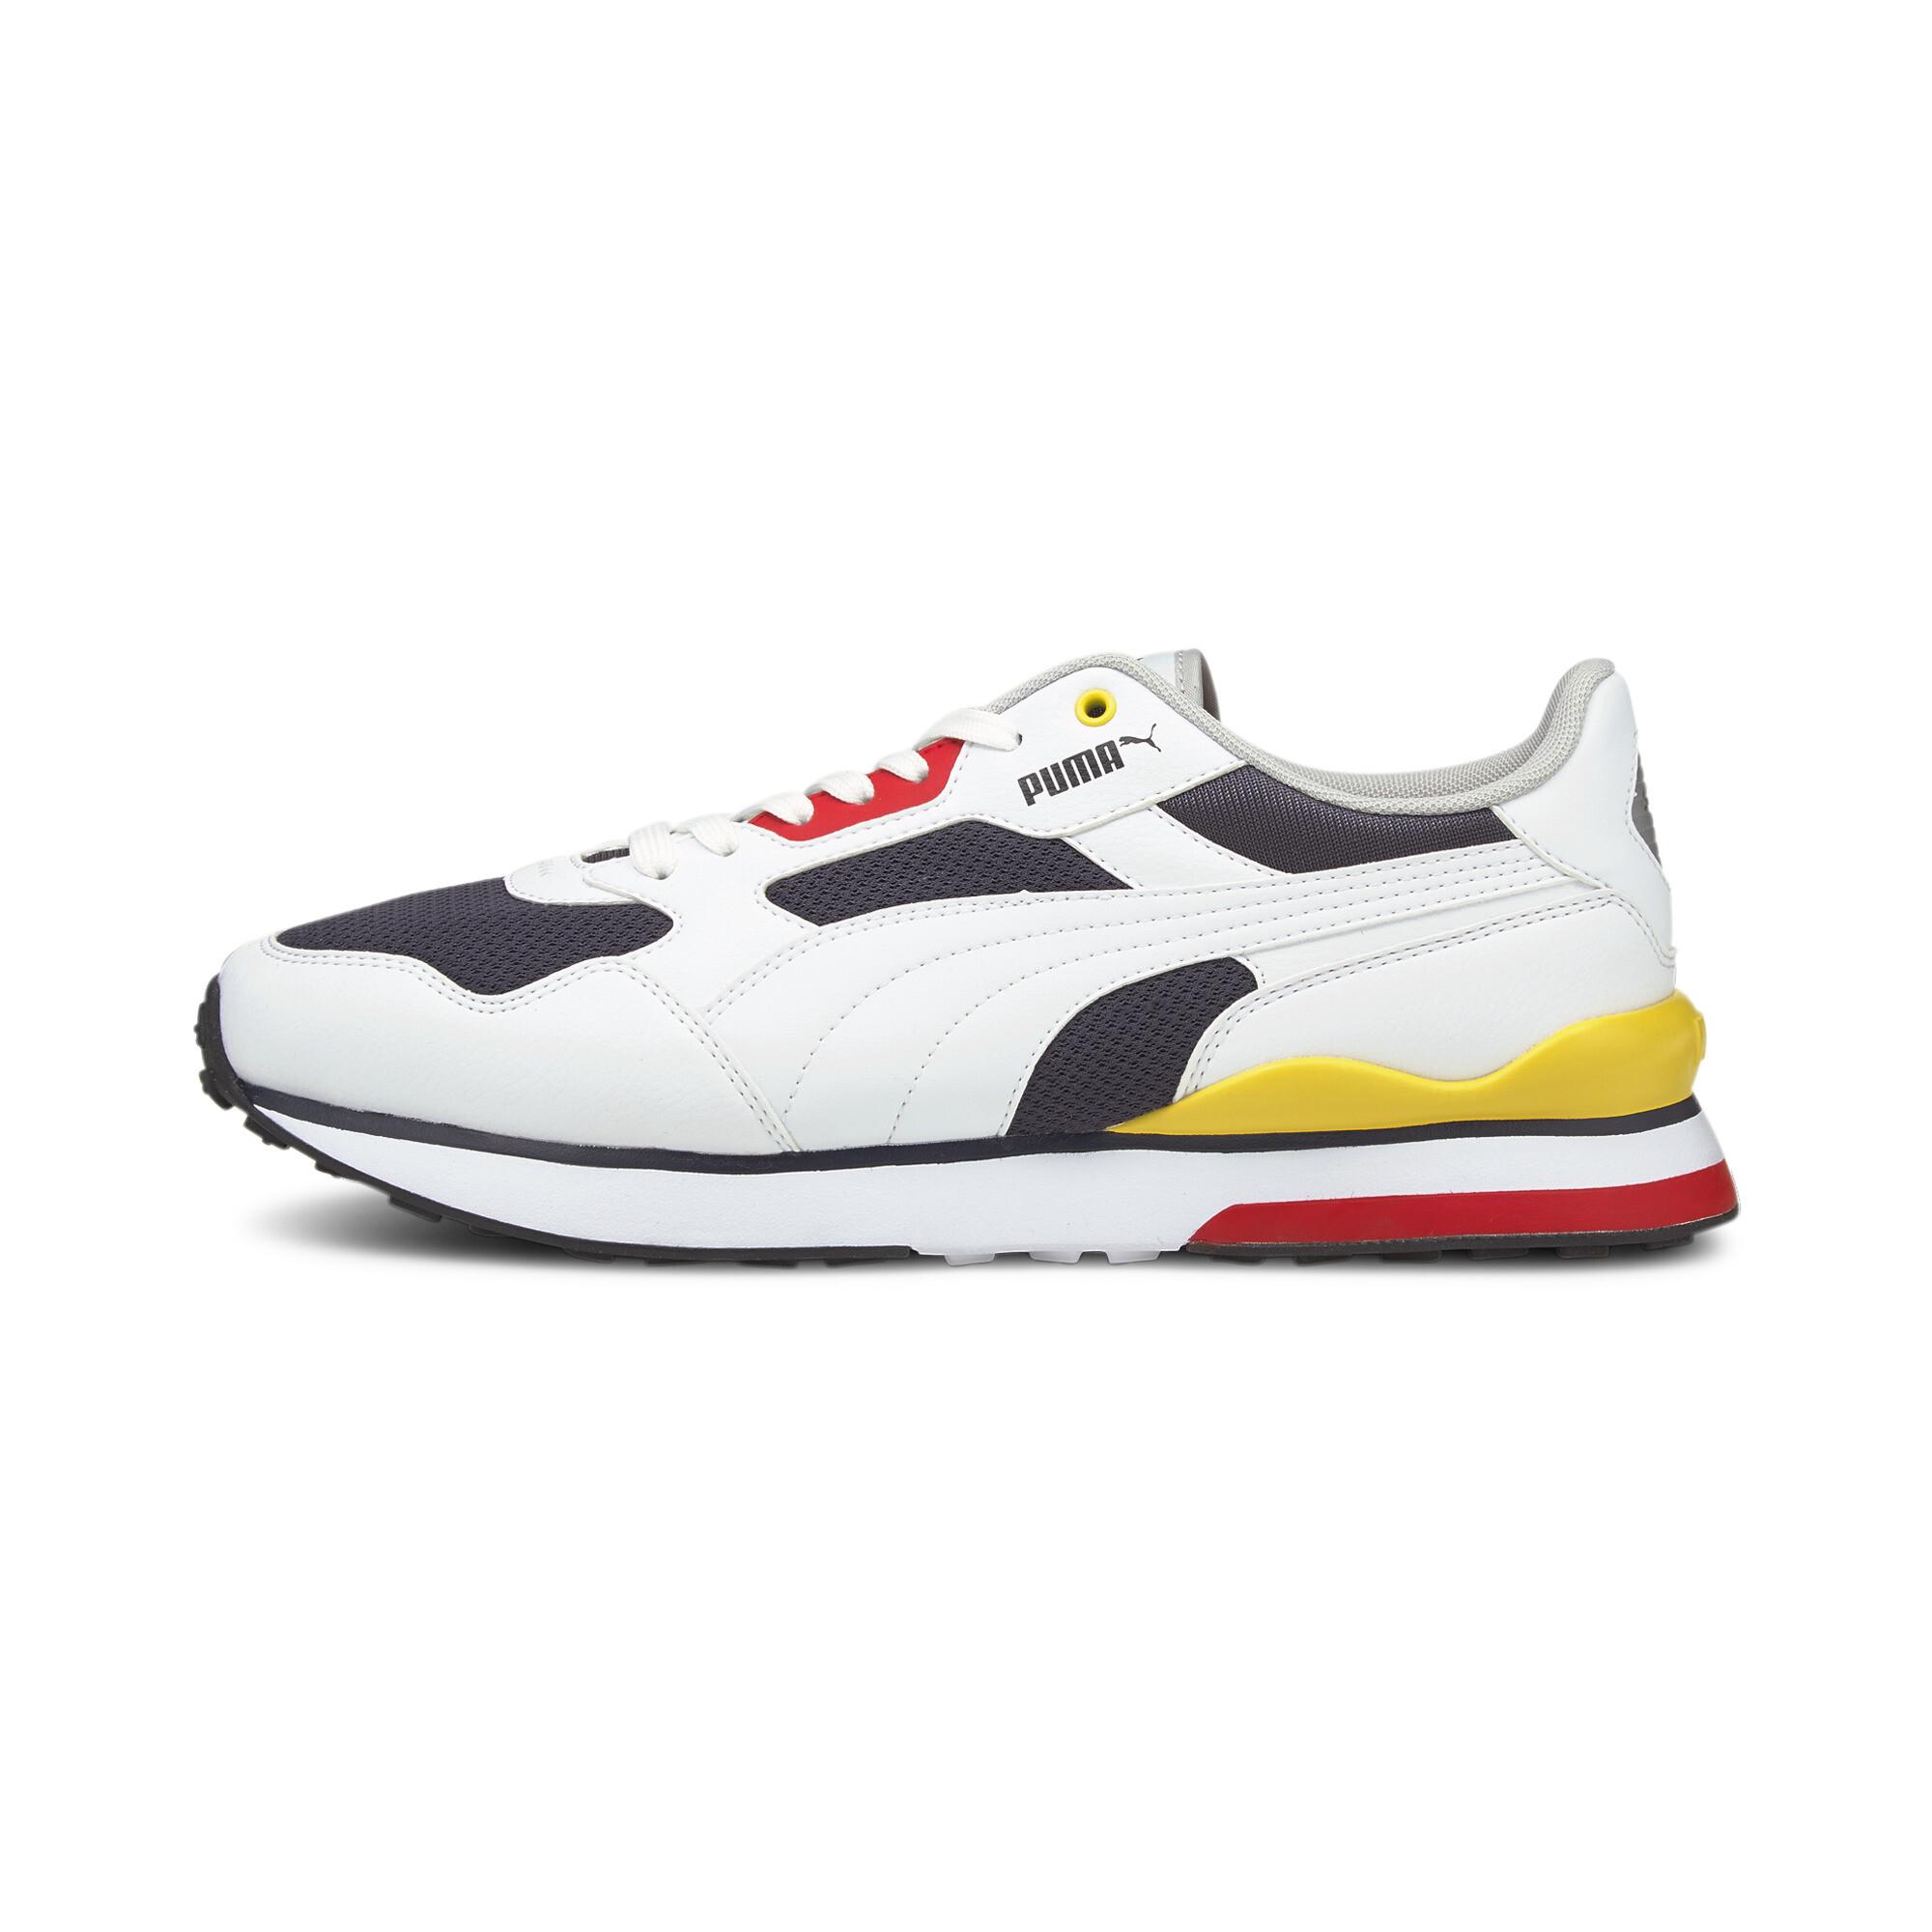 PUMA Men's R78 FUTR Sneakers | eBay